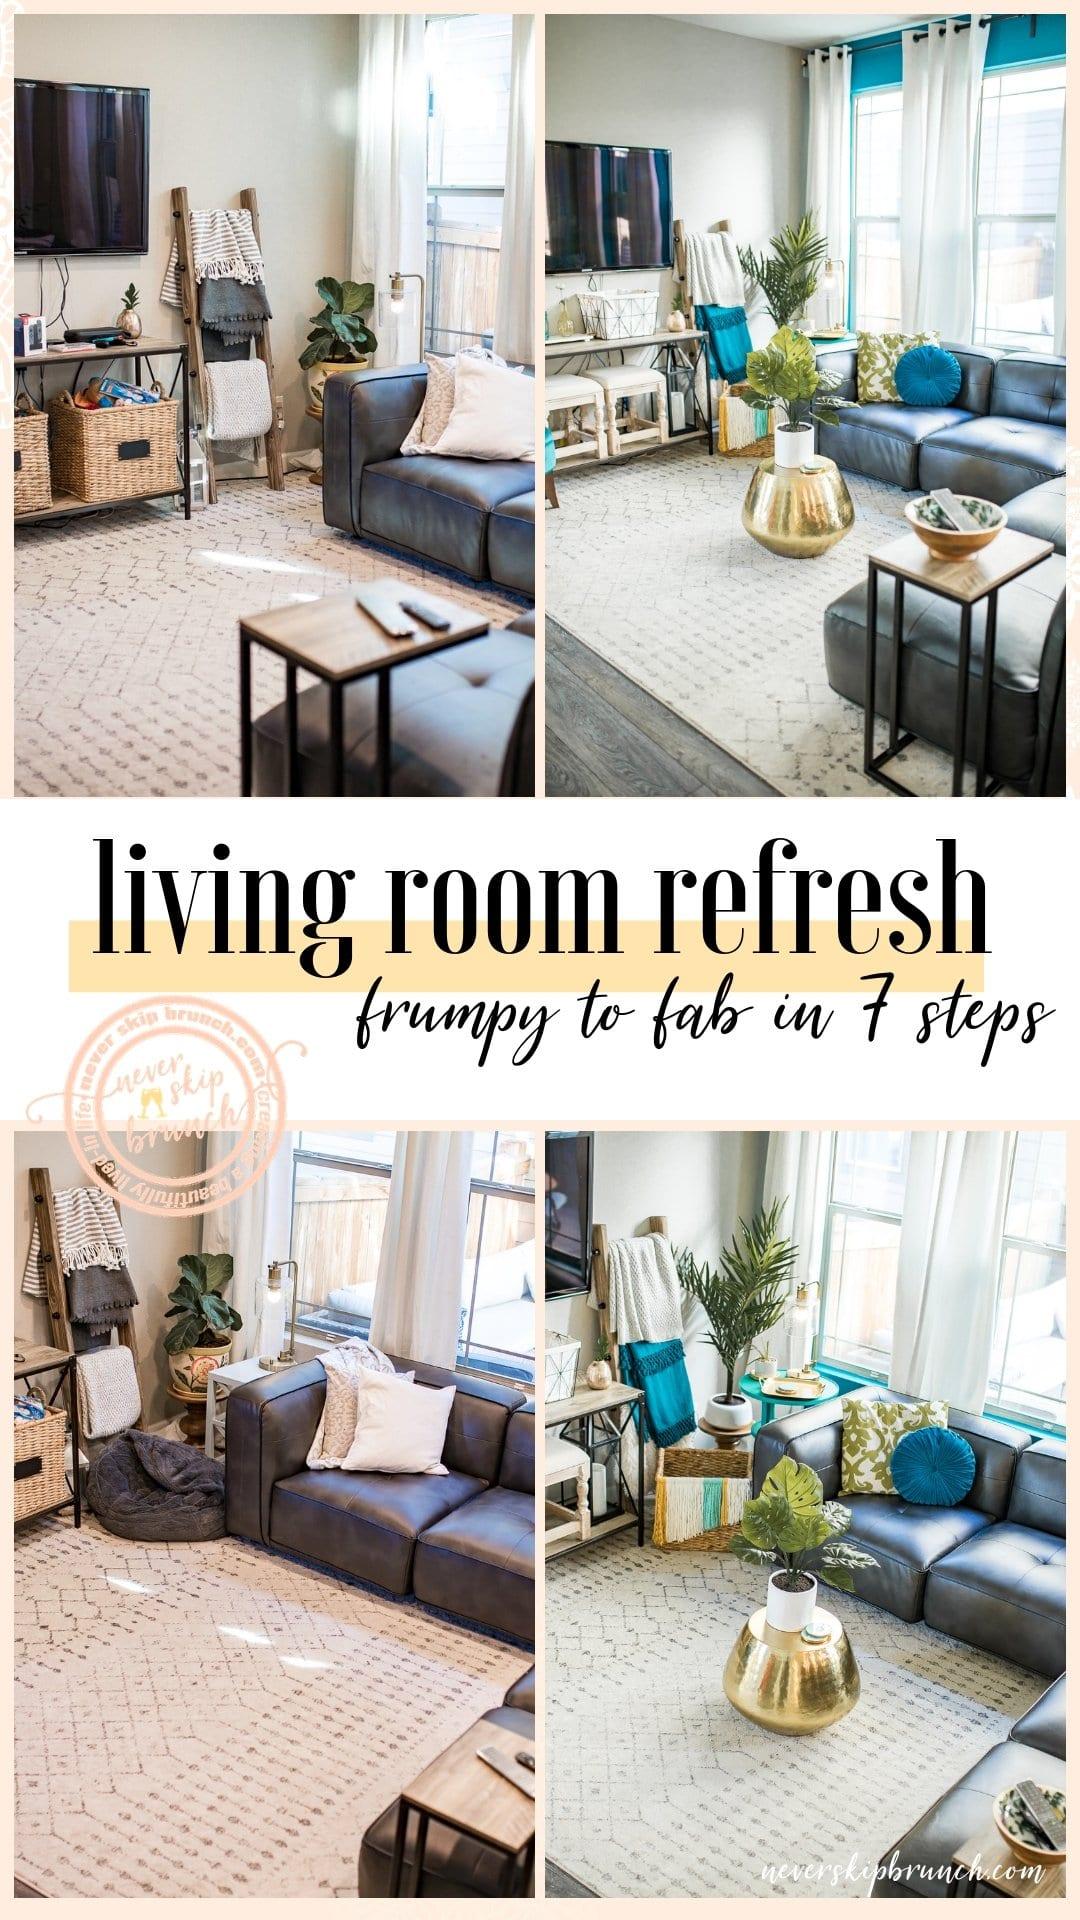 living room decor | Living Room Ideas | living room decor ideas | living room designs | living room paint color ideas | living room refresh | Never Skip Brunch by Cara Newhart | #livingroom #home #decor #neverskipbrunch